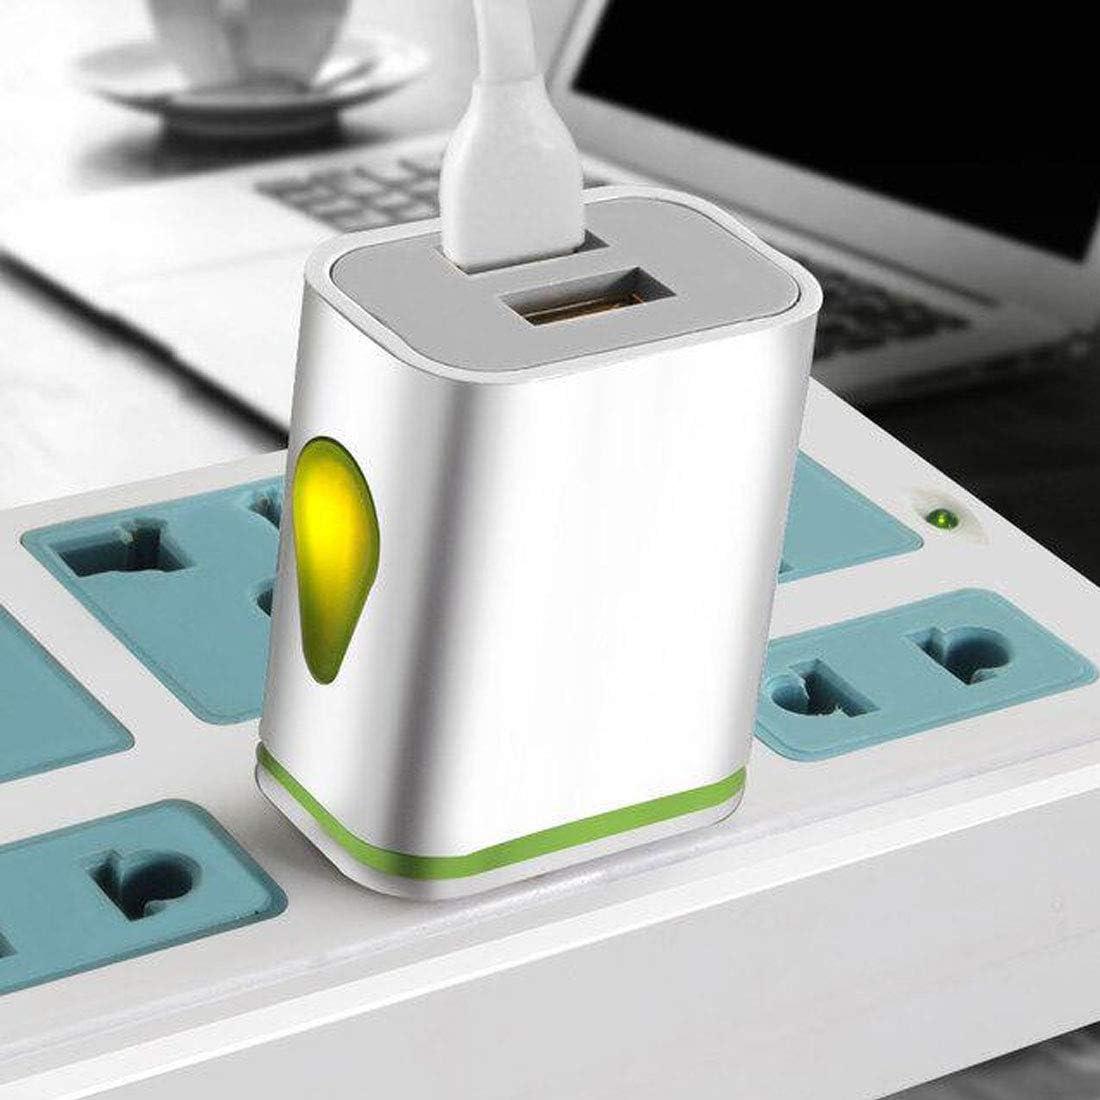 Desconocido Adaptador de Cargador Dual USB Indicador LED de